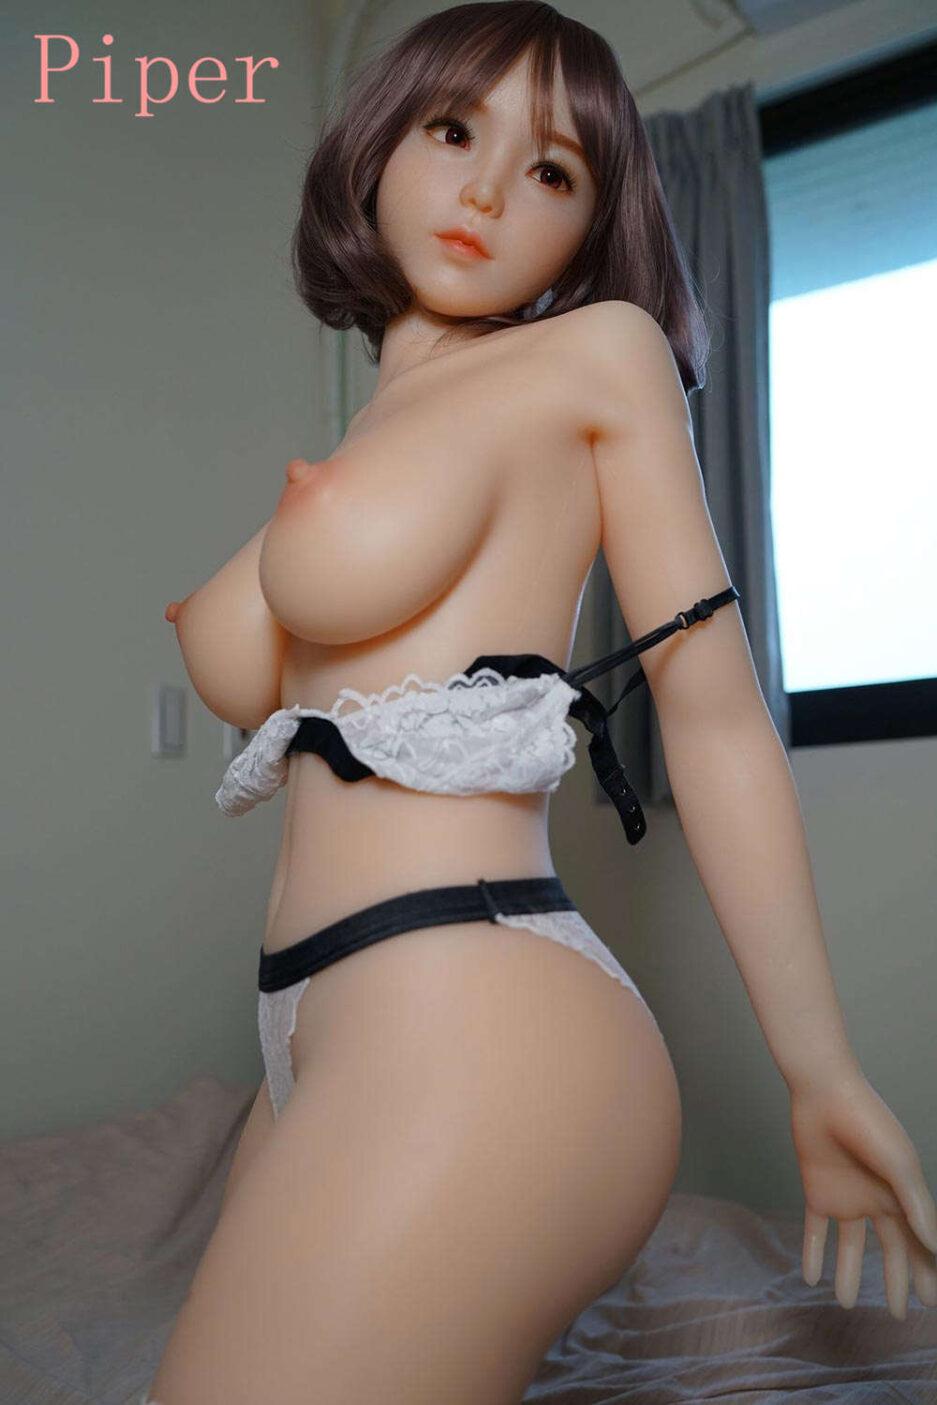 Sex doll in white lace underwear